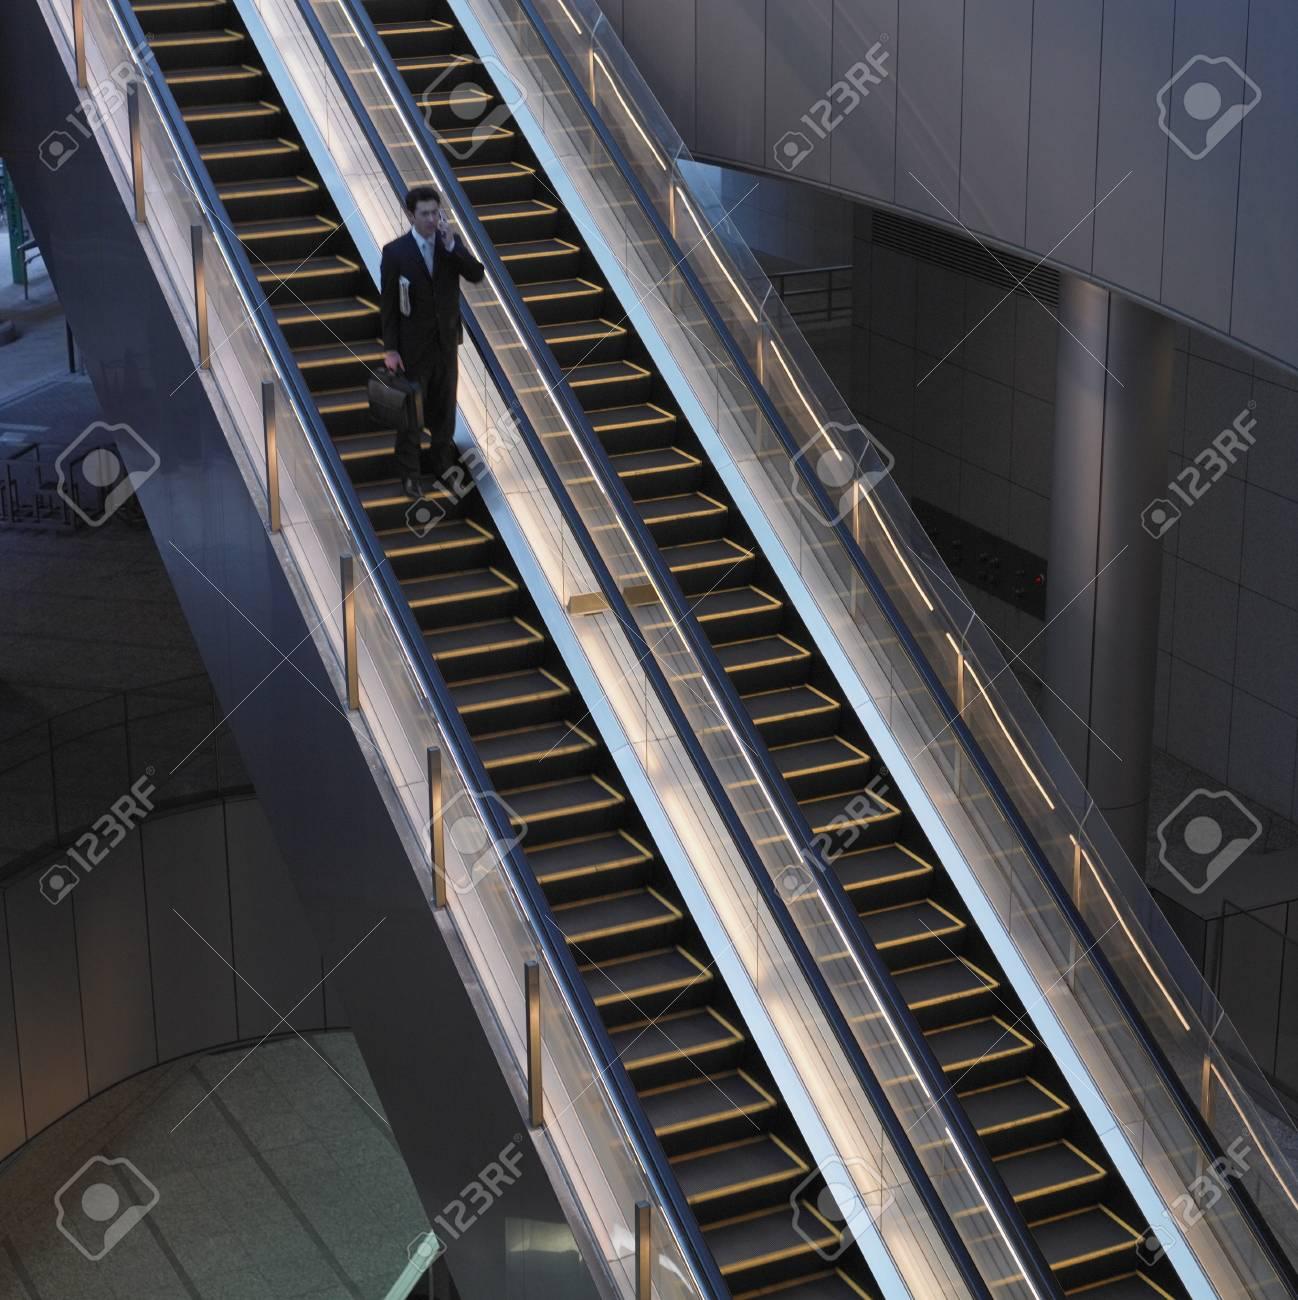 Businessman with briefcase on escalator Stock Photo - 16092061